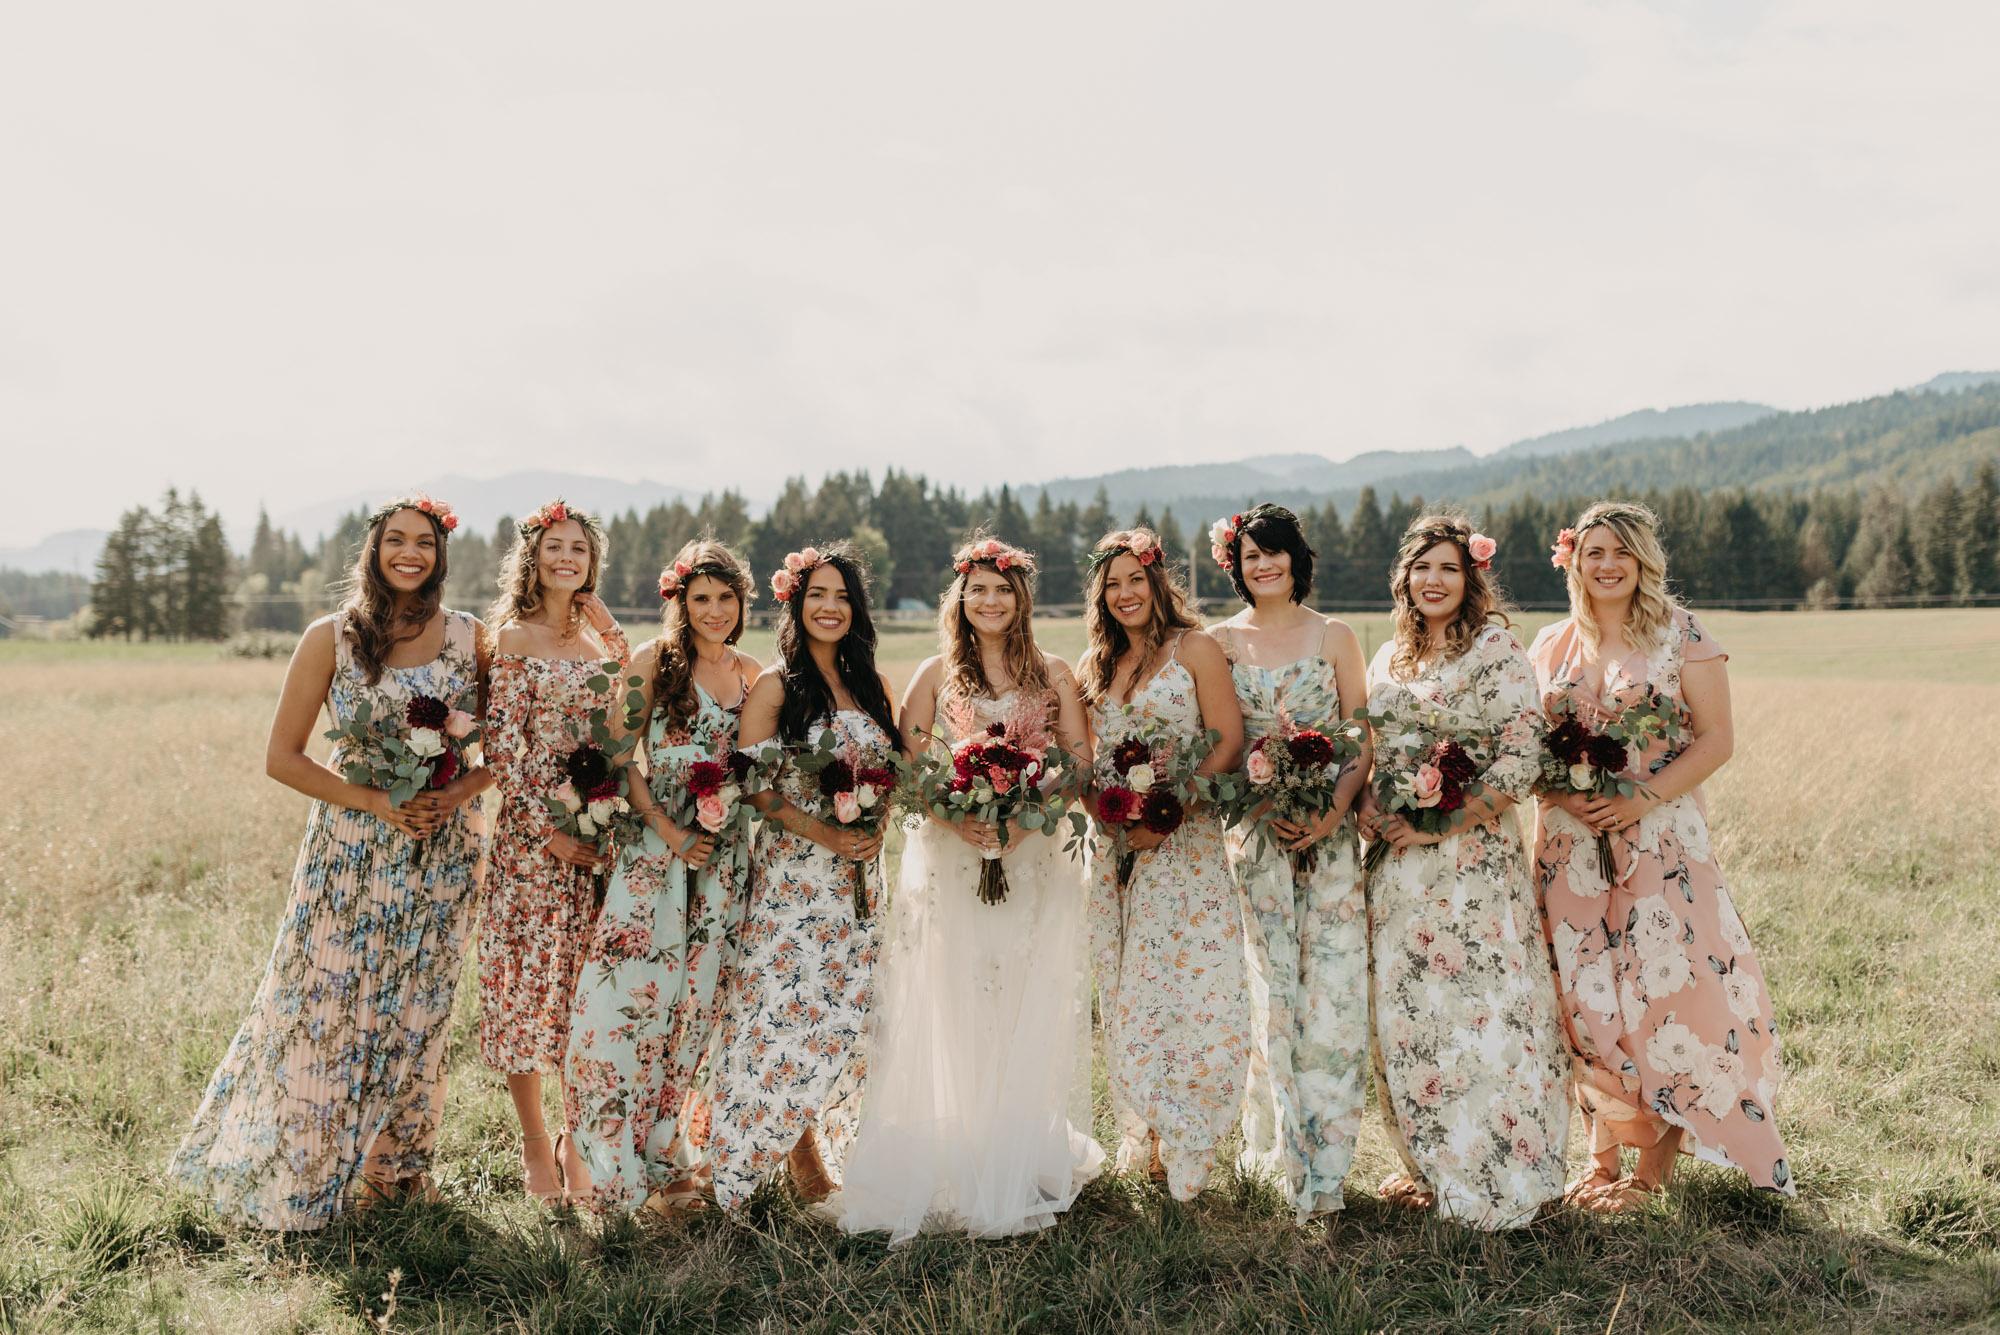 Bridal-Party-Free-People-Flower-Dresses-Washington-Wedding-8430.jpg